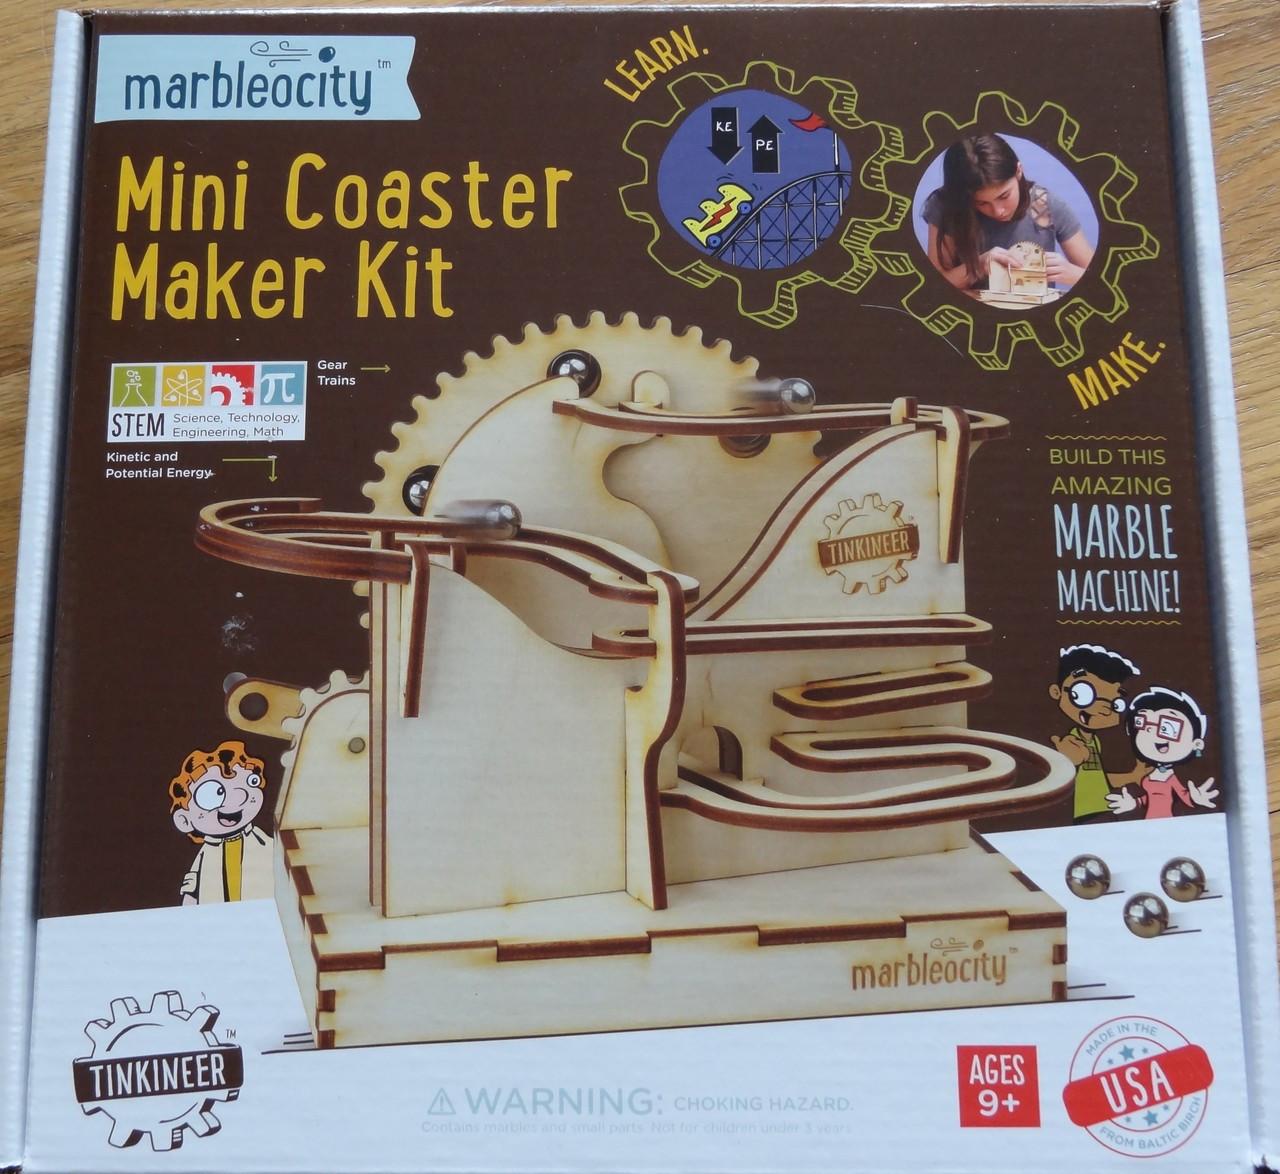 Chaos Mountain Maker Kit Marbleocity Tinkineer Marble Run MACM100BB